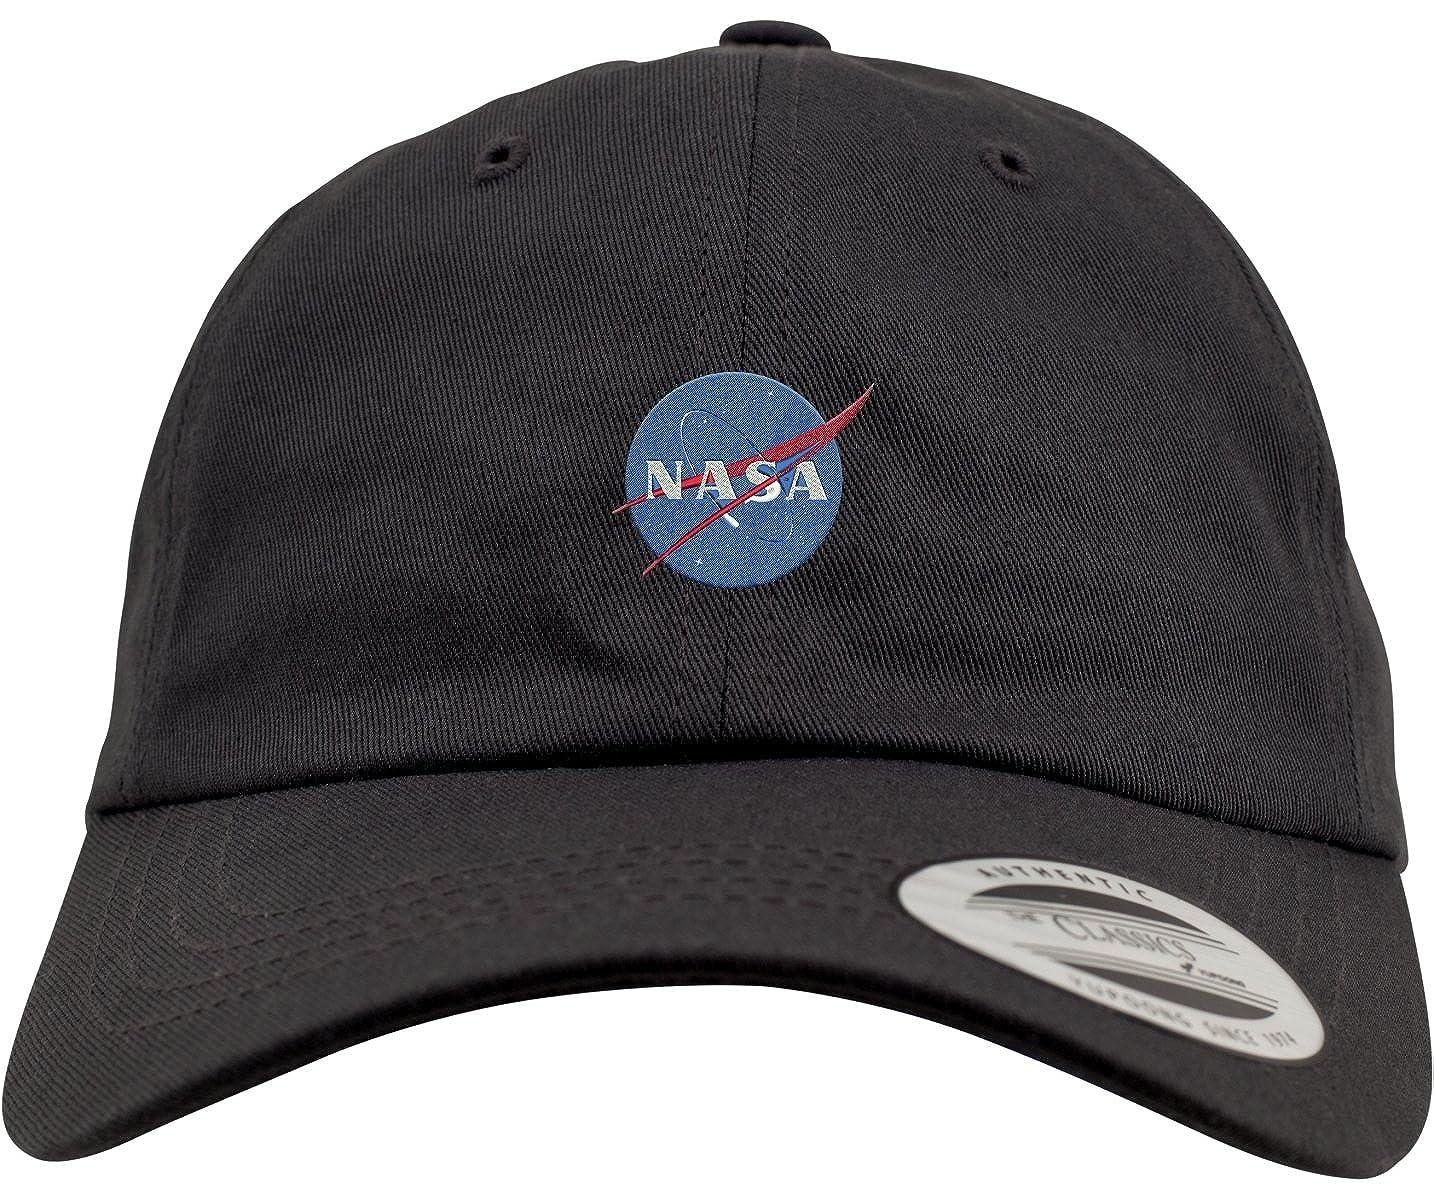 Mister té (misuq) NASA Dad Cap dadcap, Black, One Size: Amazon.es ...